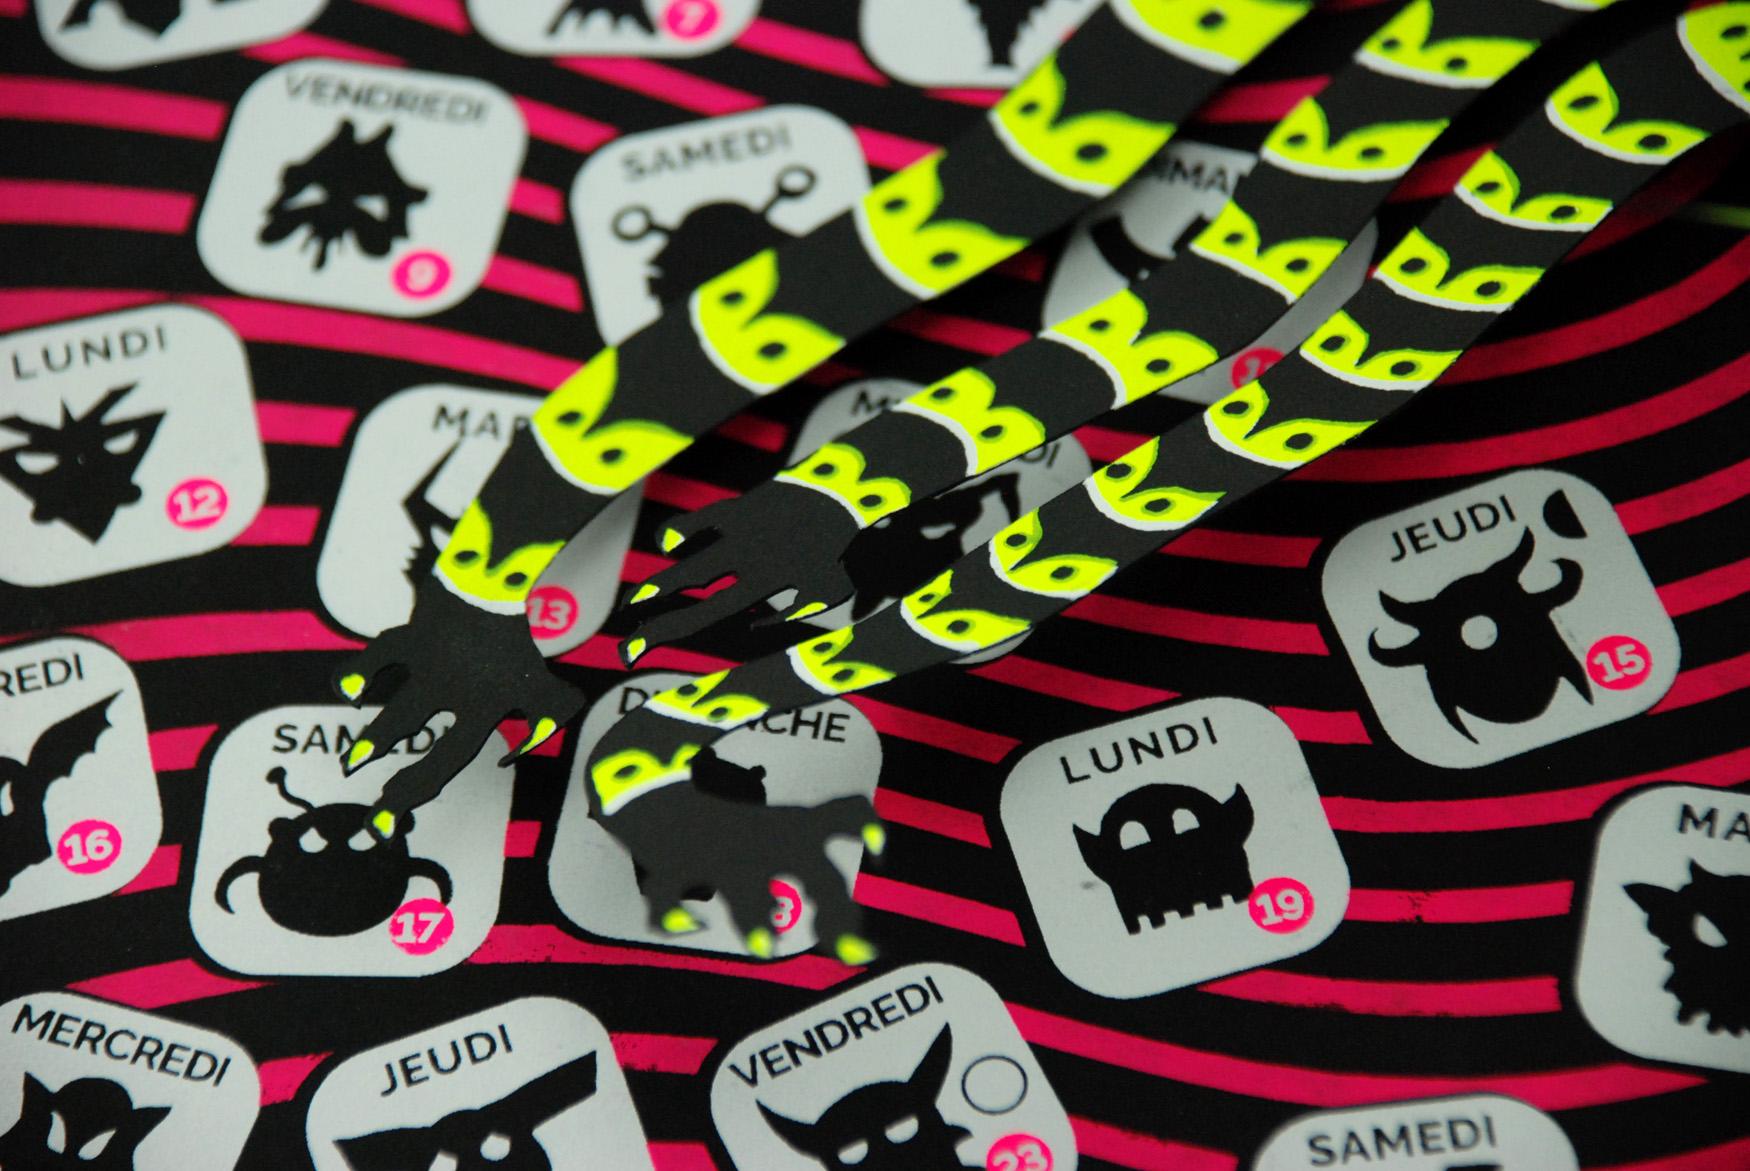 kaiju, paw, popup, pop-up, card, tokusatsu, go nagai, tristan perreton, claire andlauer, kirigami